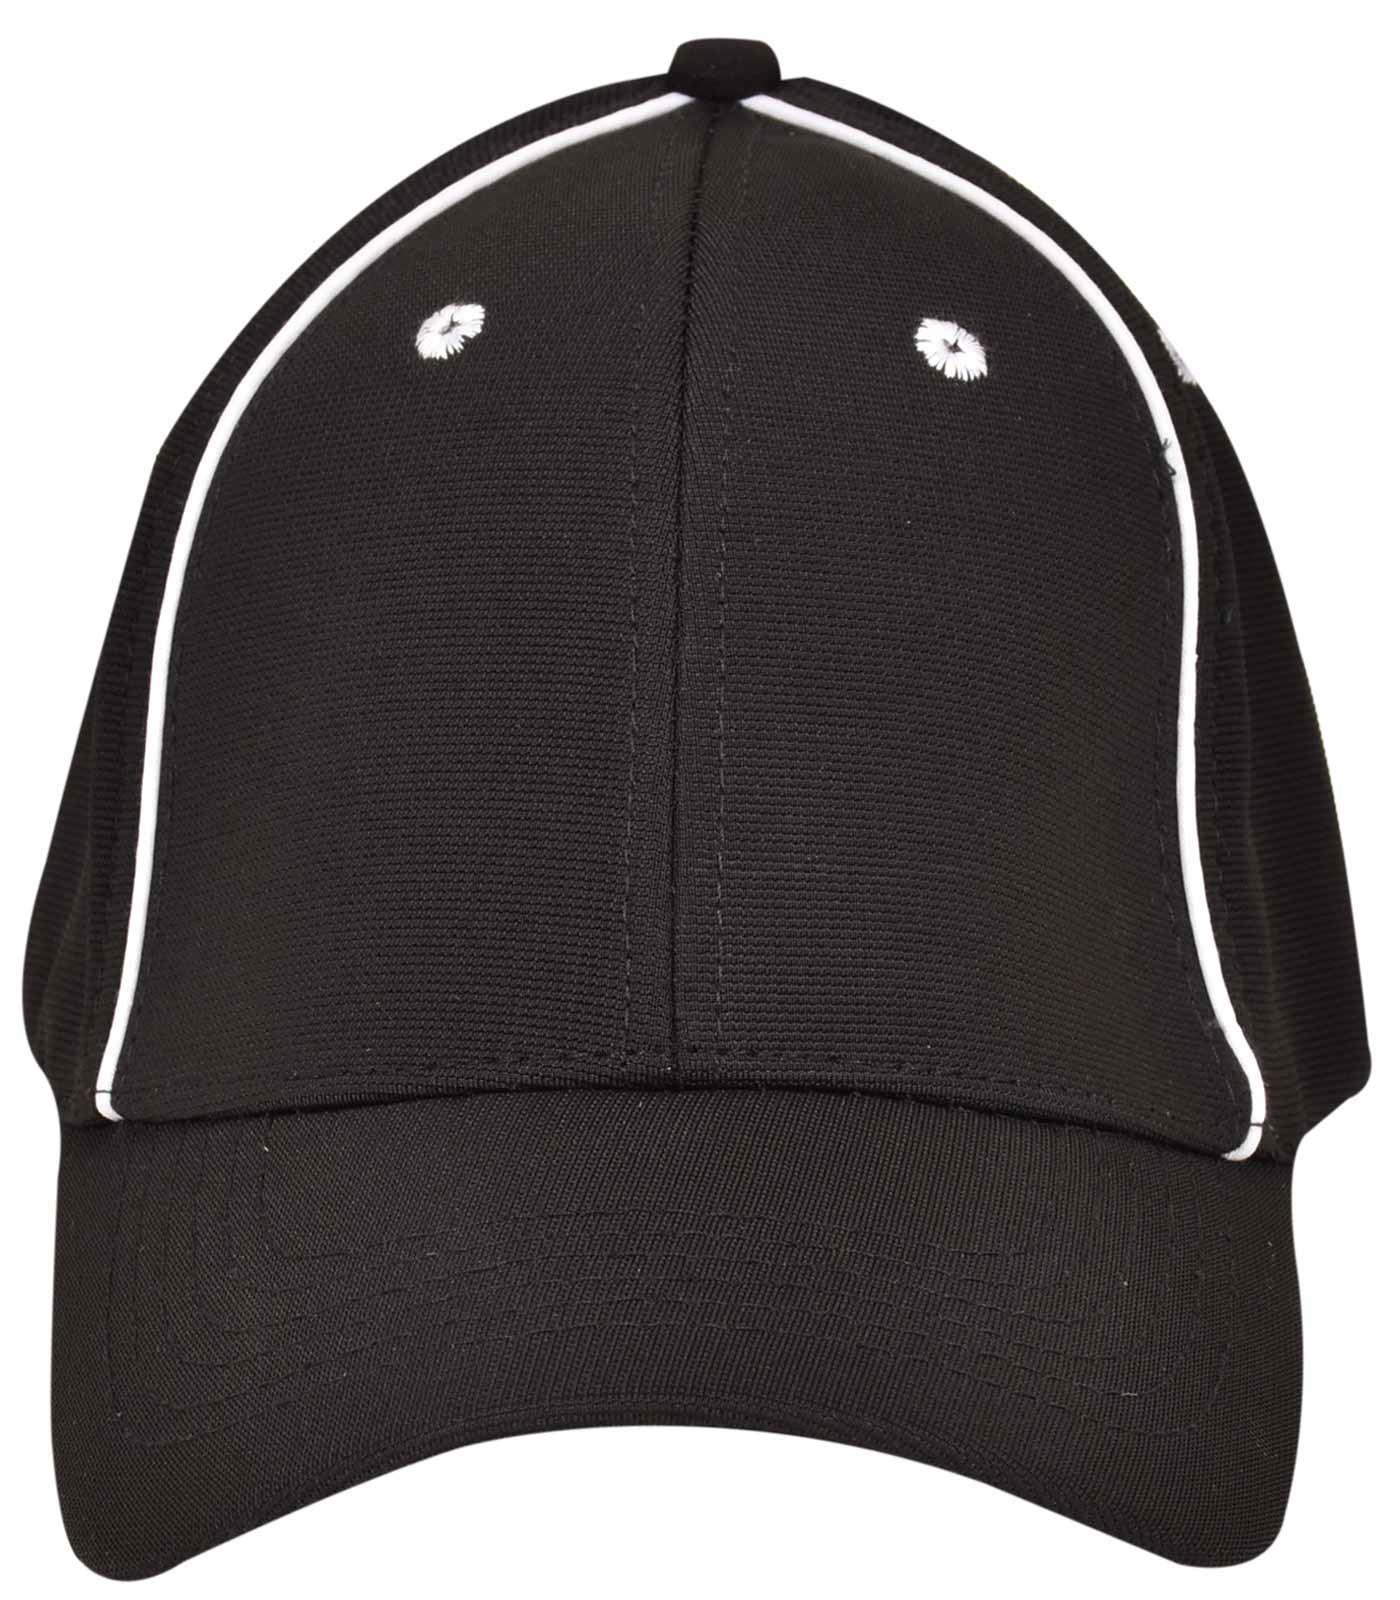 Mens Womens Plain Fitted Baseball Cap Visor Sports Curved Peak Hat ... 1e427e105b1a